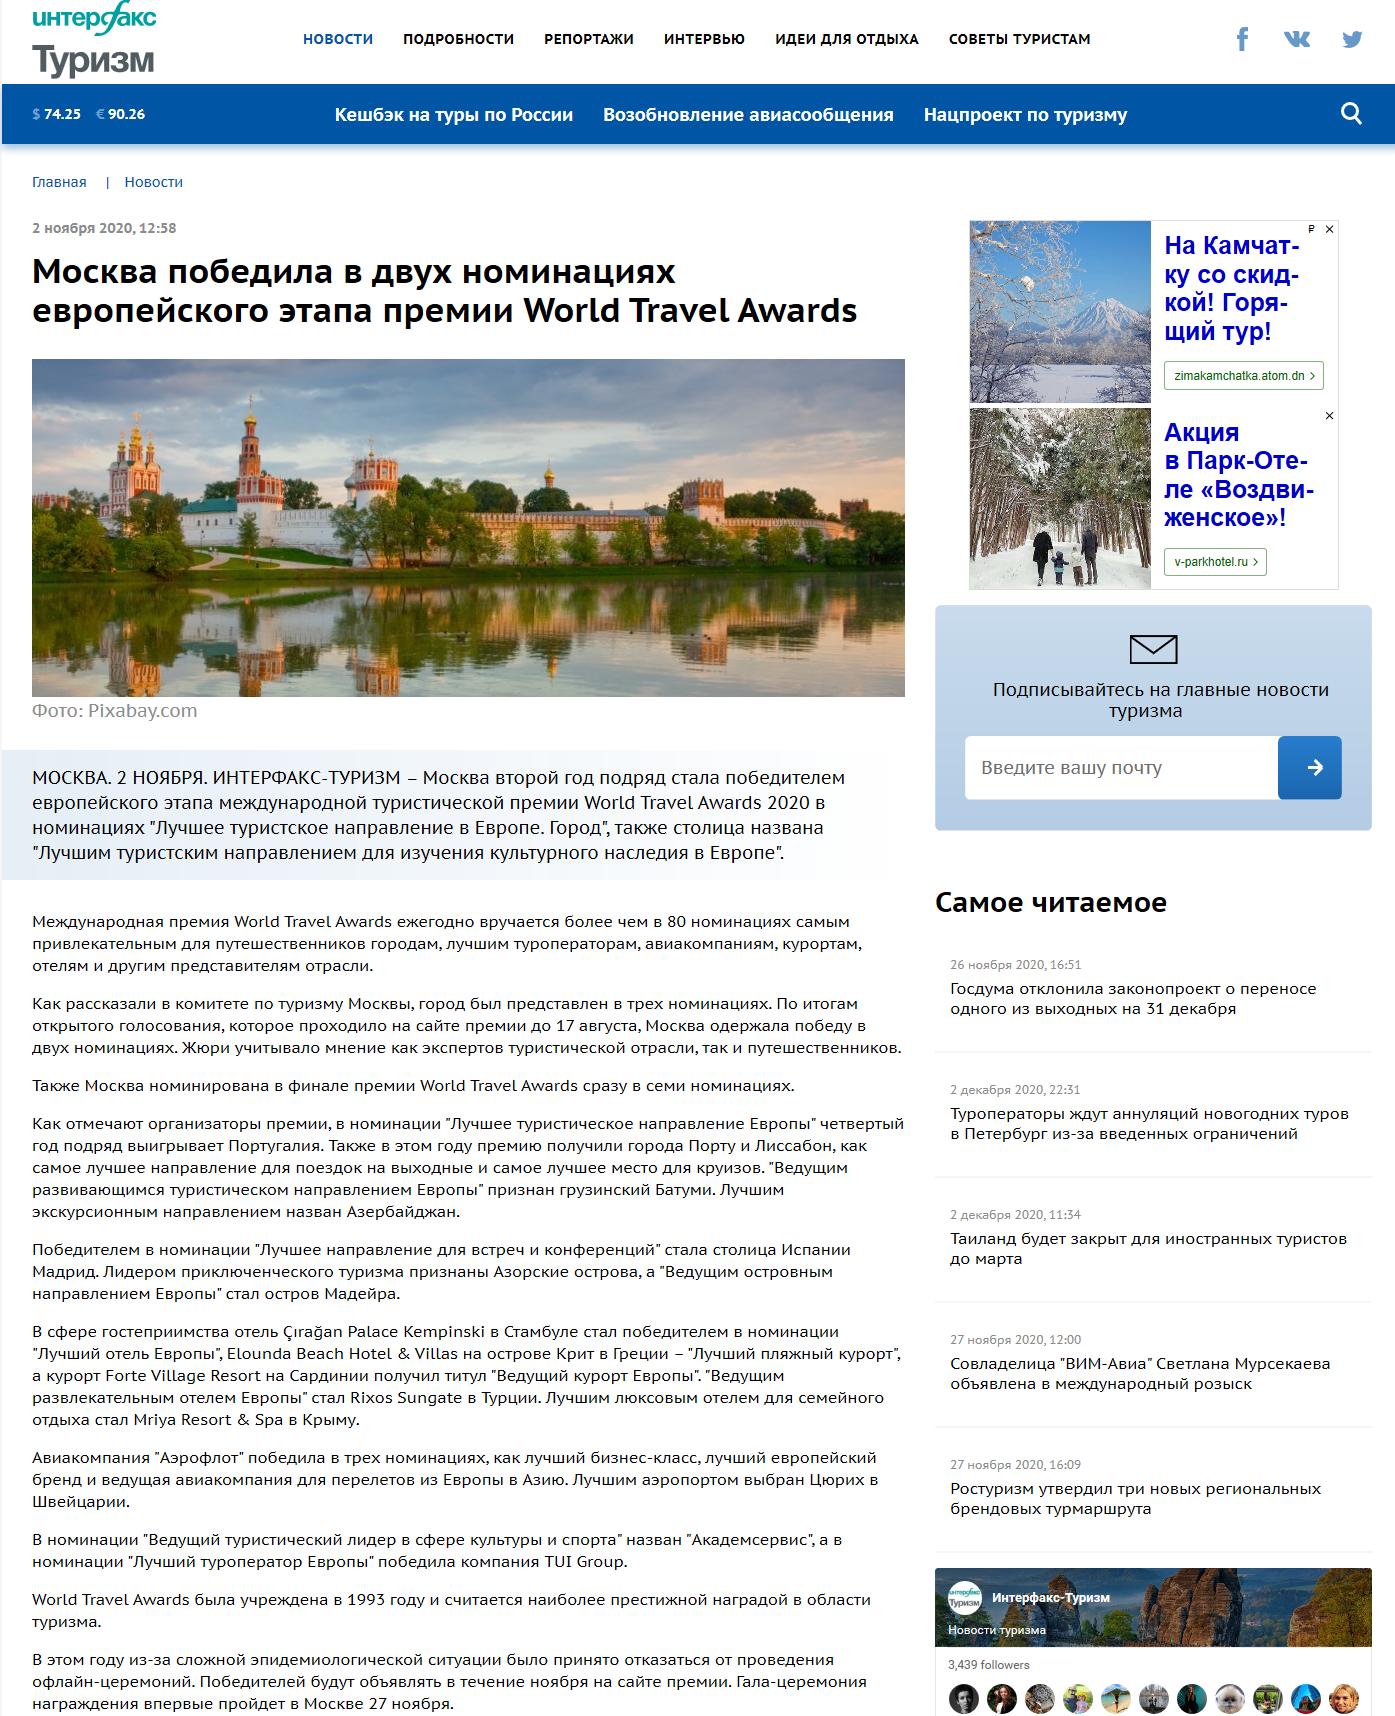 Информационное агентство «Интерфакс Туризм», https://tourism.interfax.ru, 02.11.2020